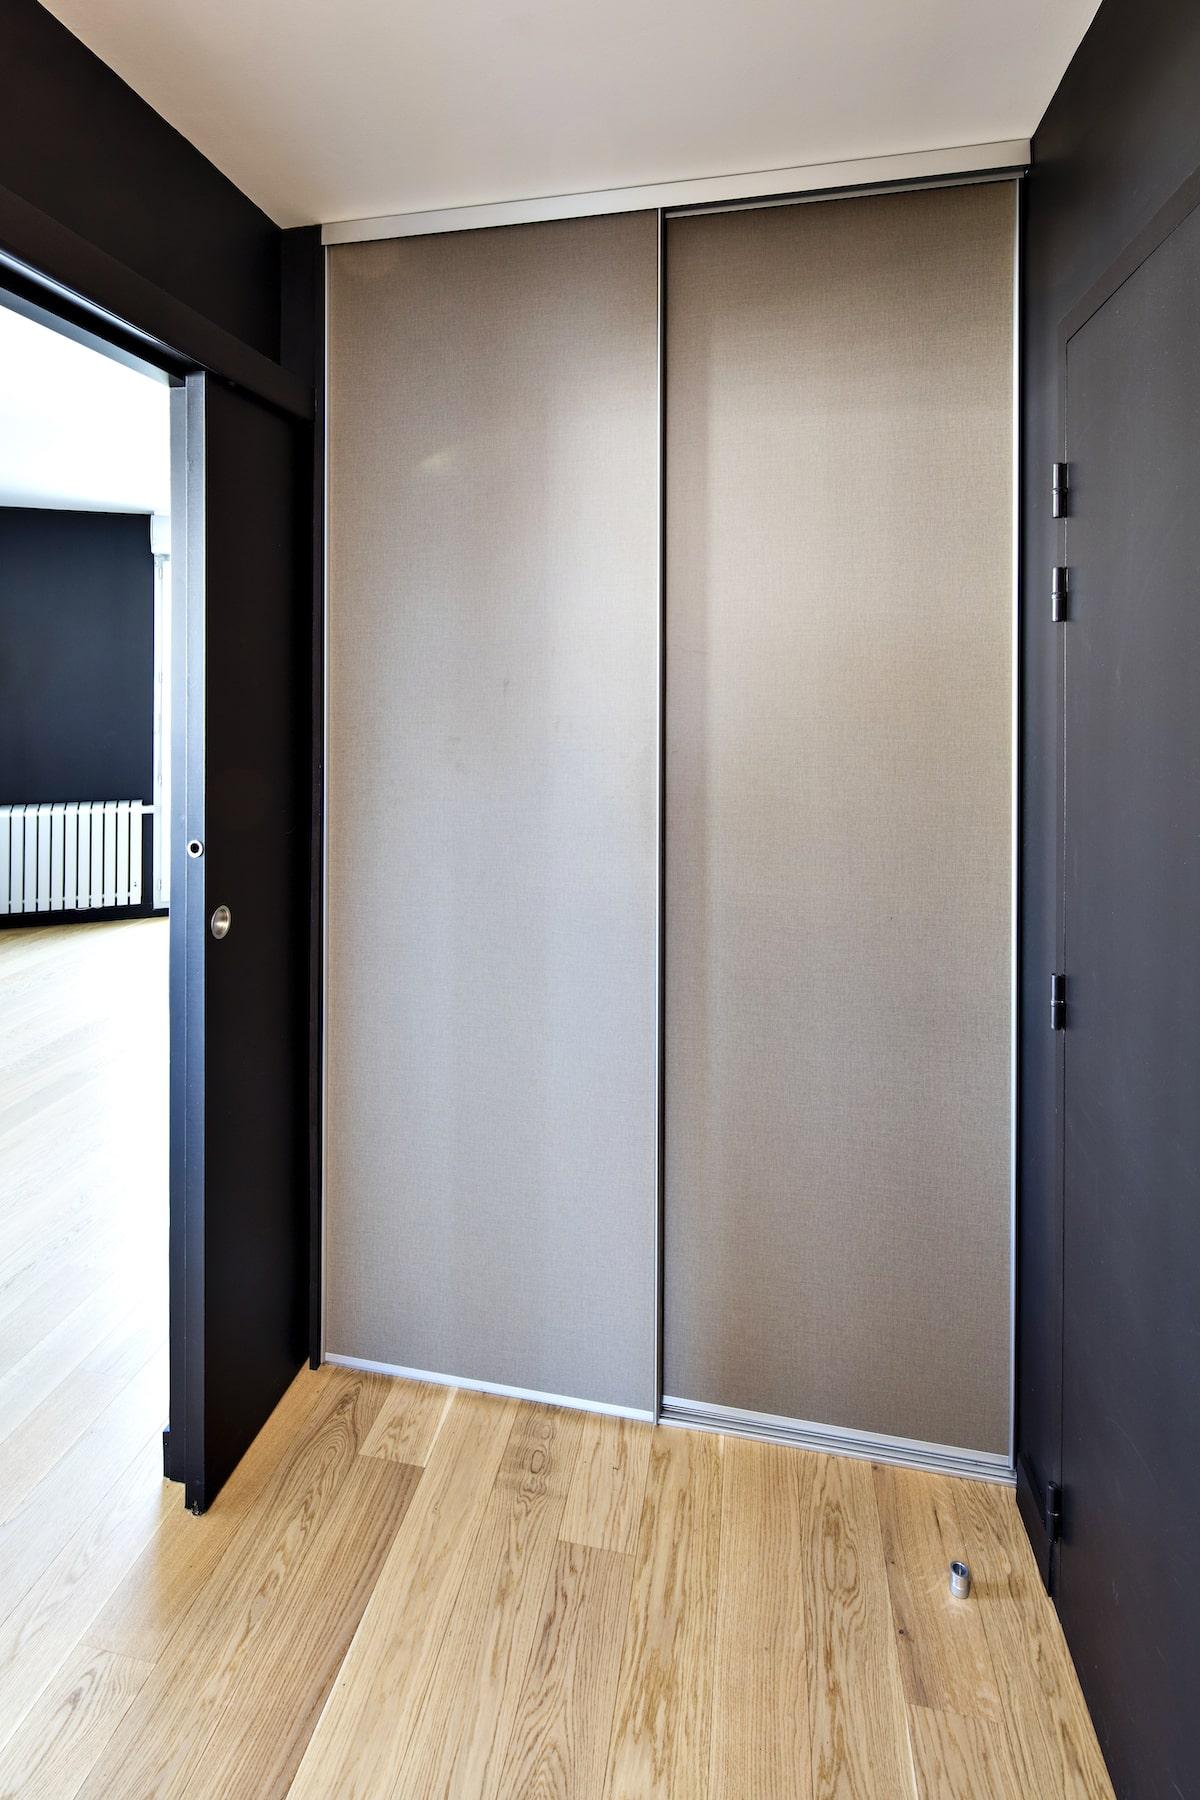 placard dressing portes coulissantes couleur taupe